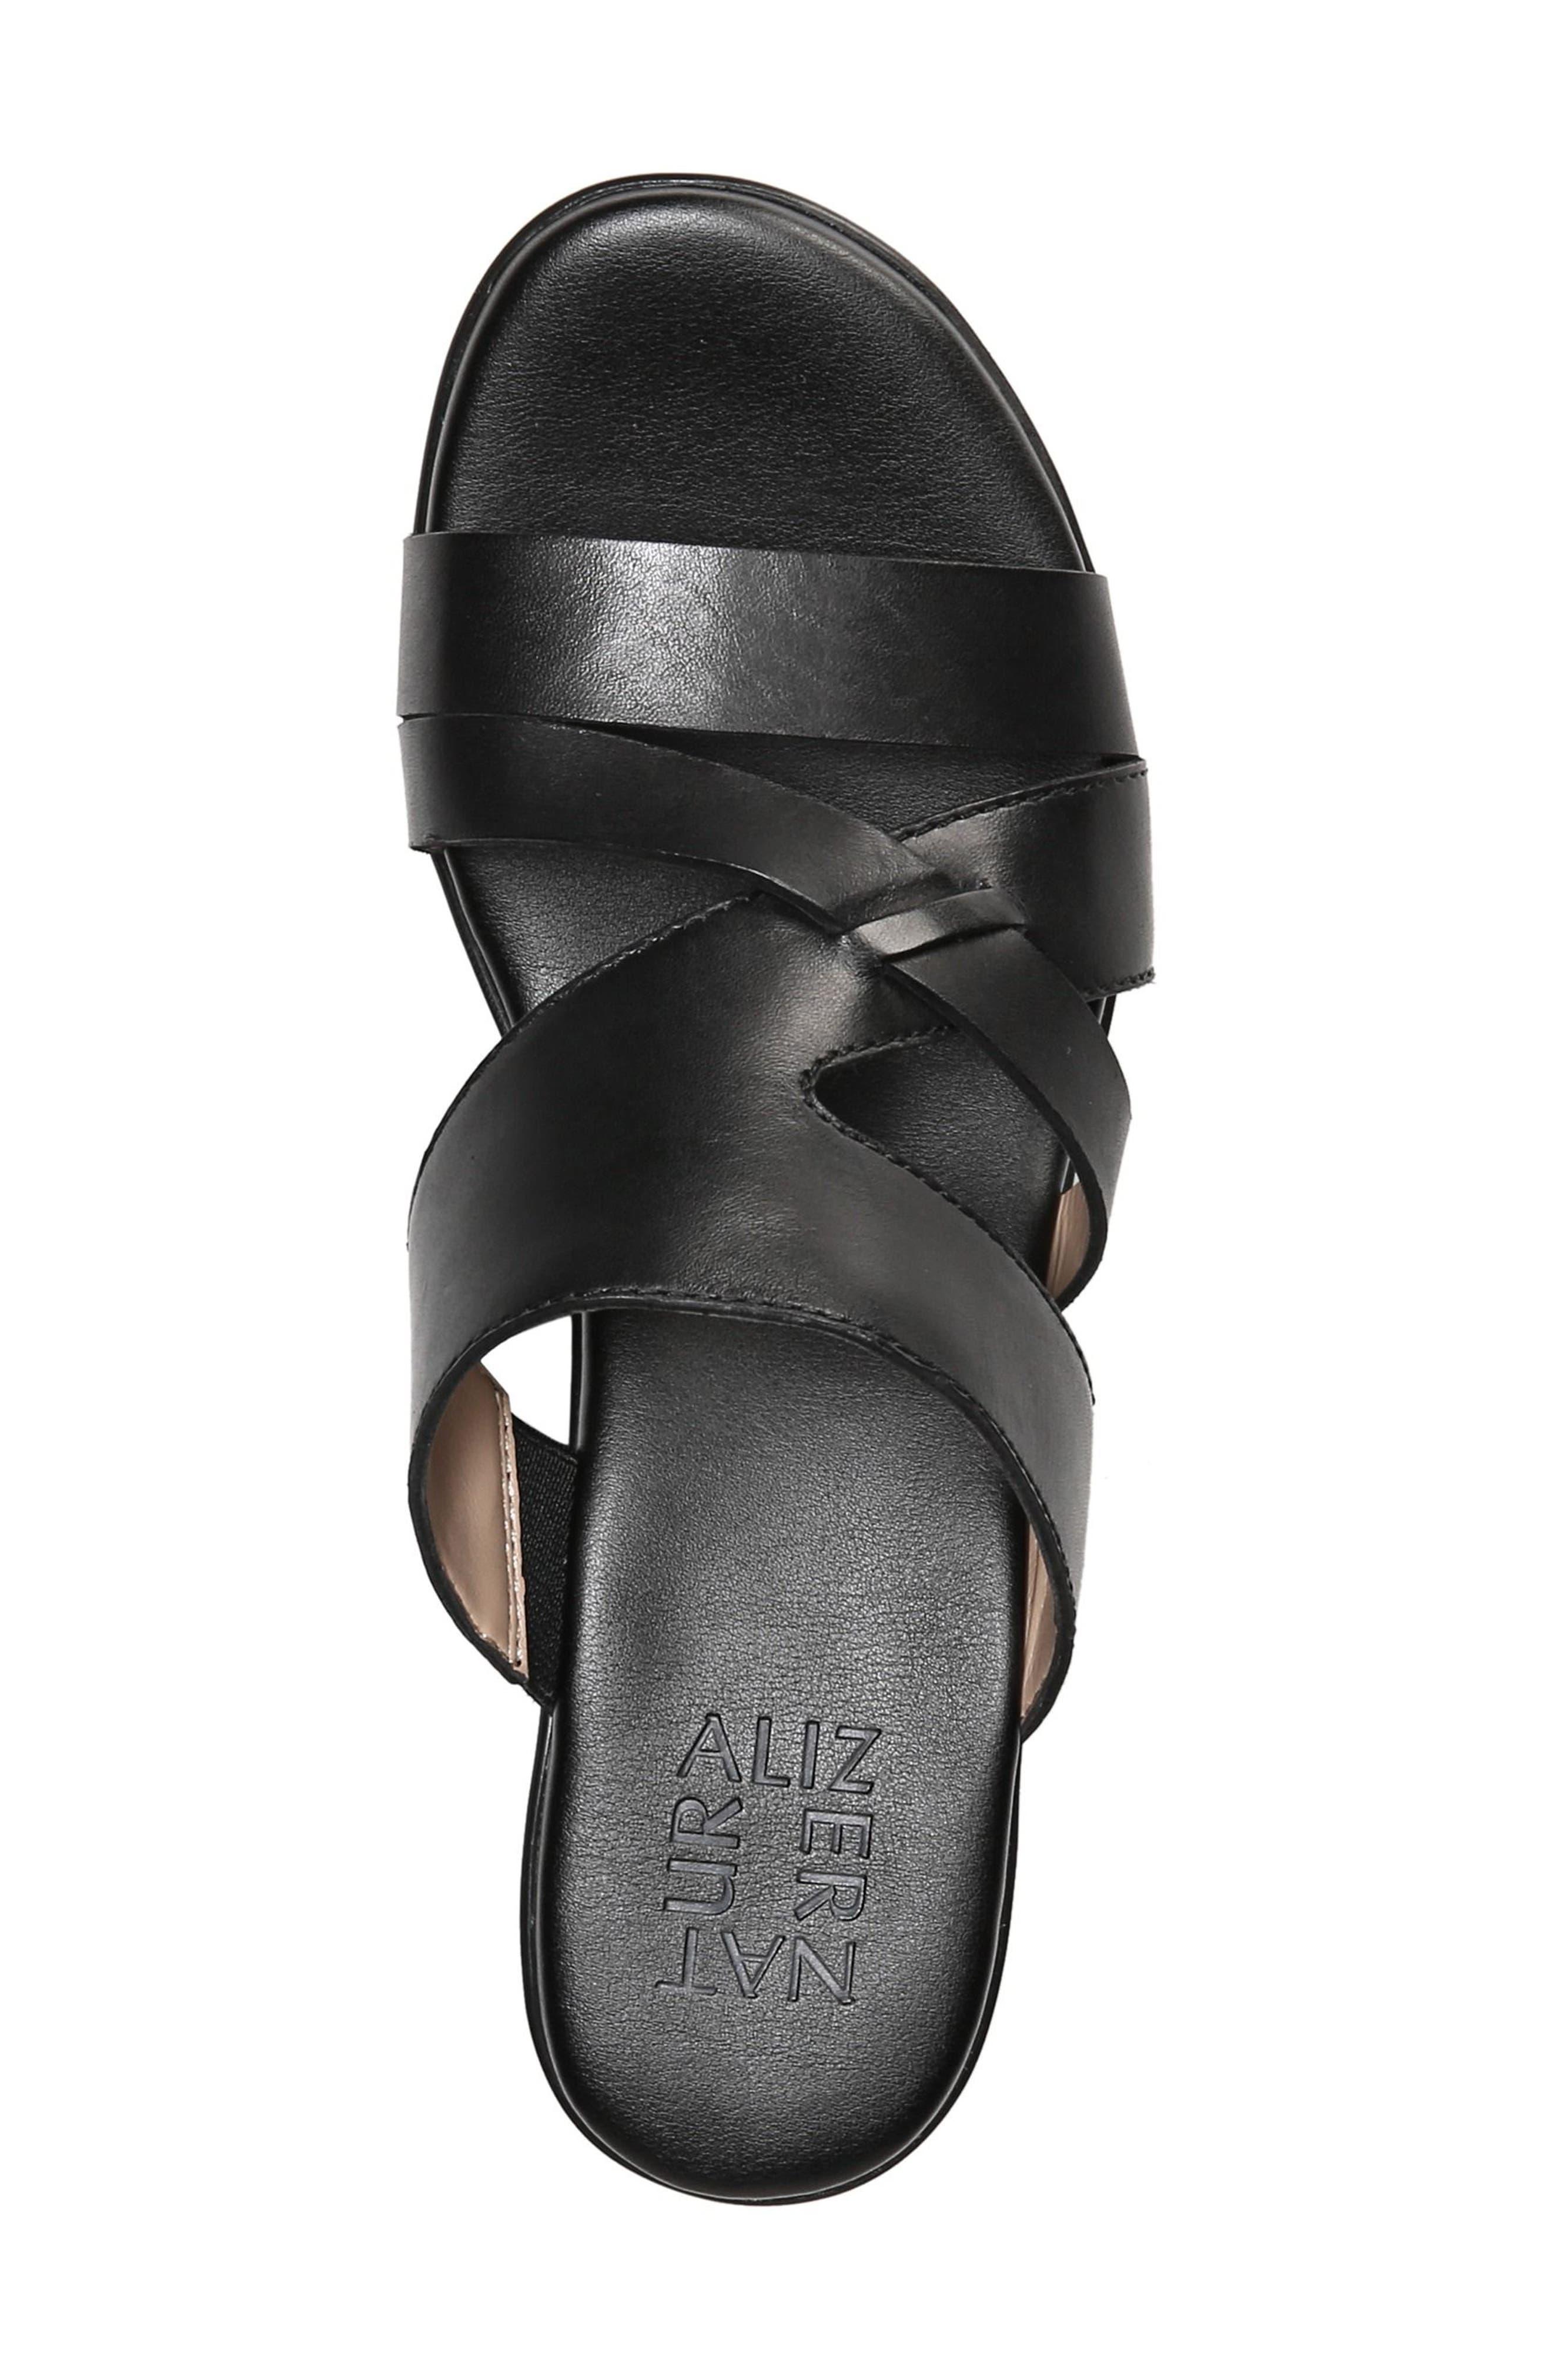 Vivy Wedge Sandal,                             Alternate thumbnail 5, color,                             BLACK LEATHER